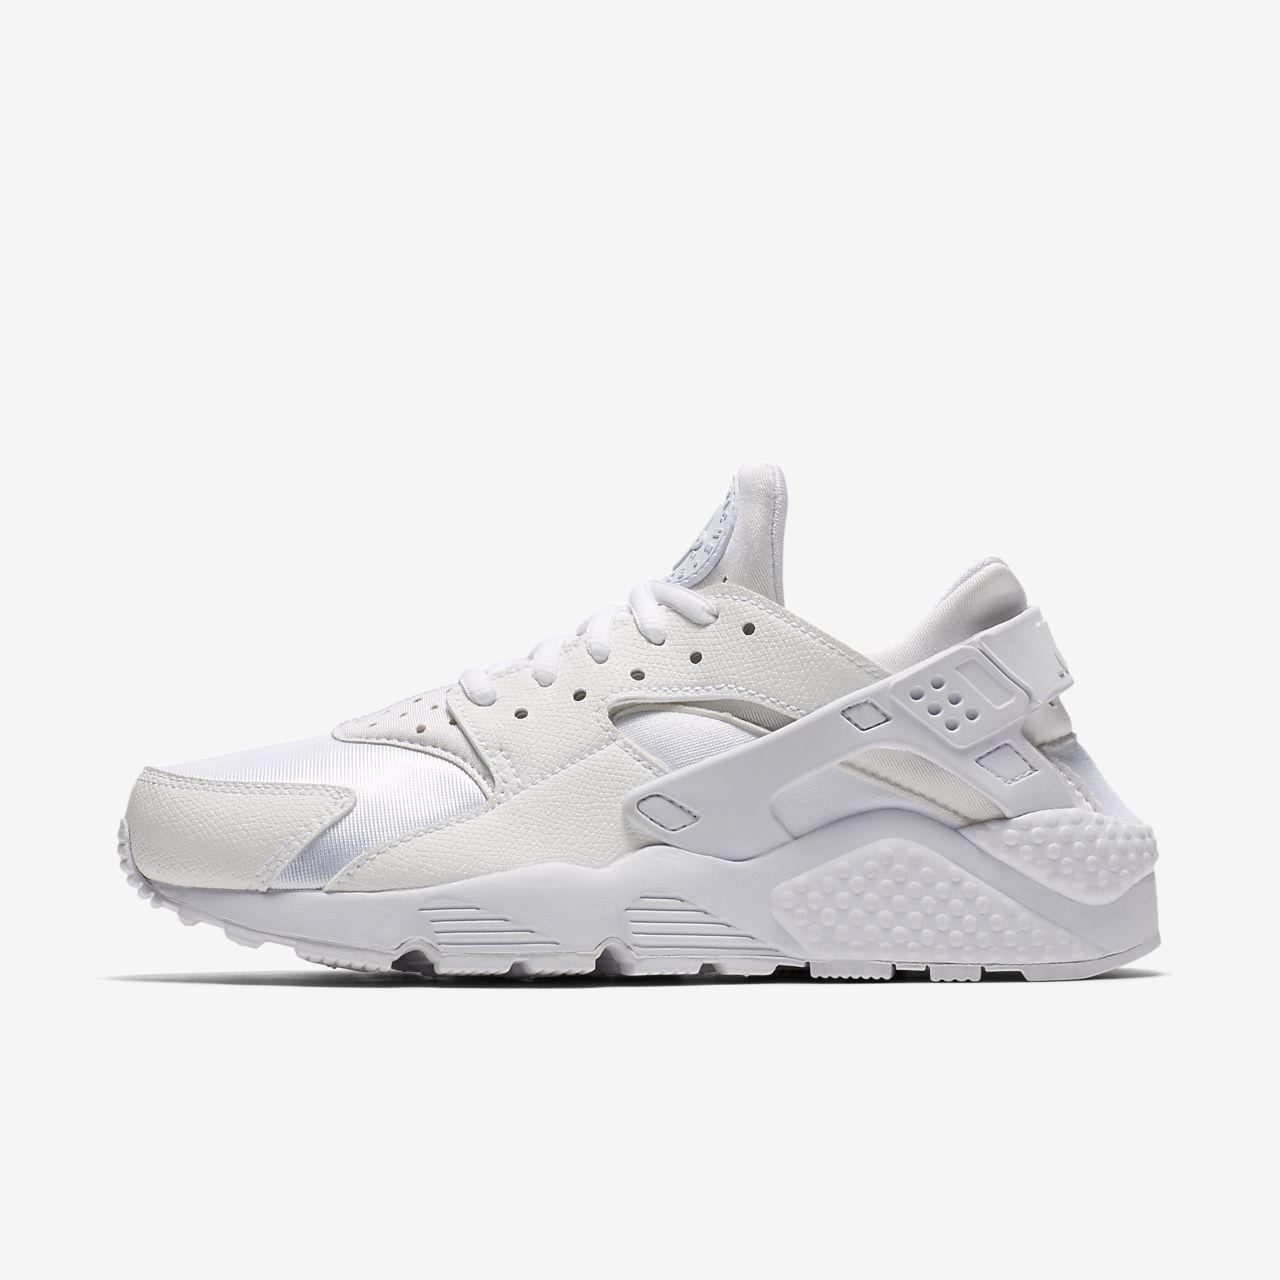 Barry girar bruja  Nike Air Huarache Women's Shoe | Zapatillas huarache, Zapatillas mujer,  Zapato deportivo de mujer